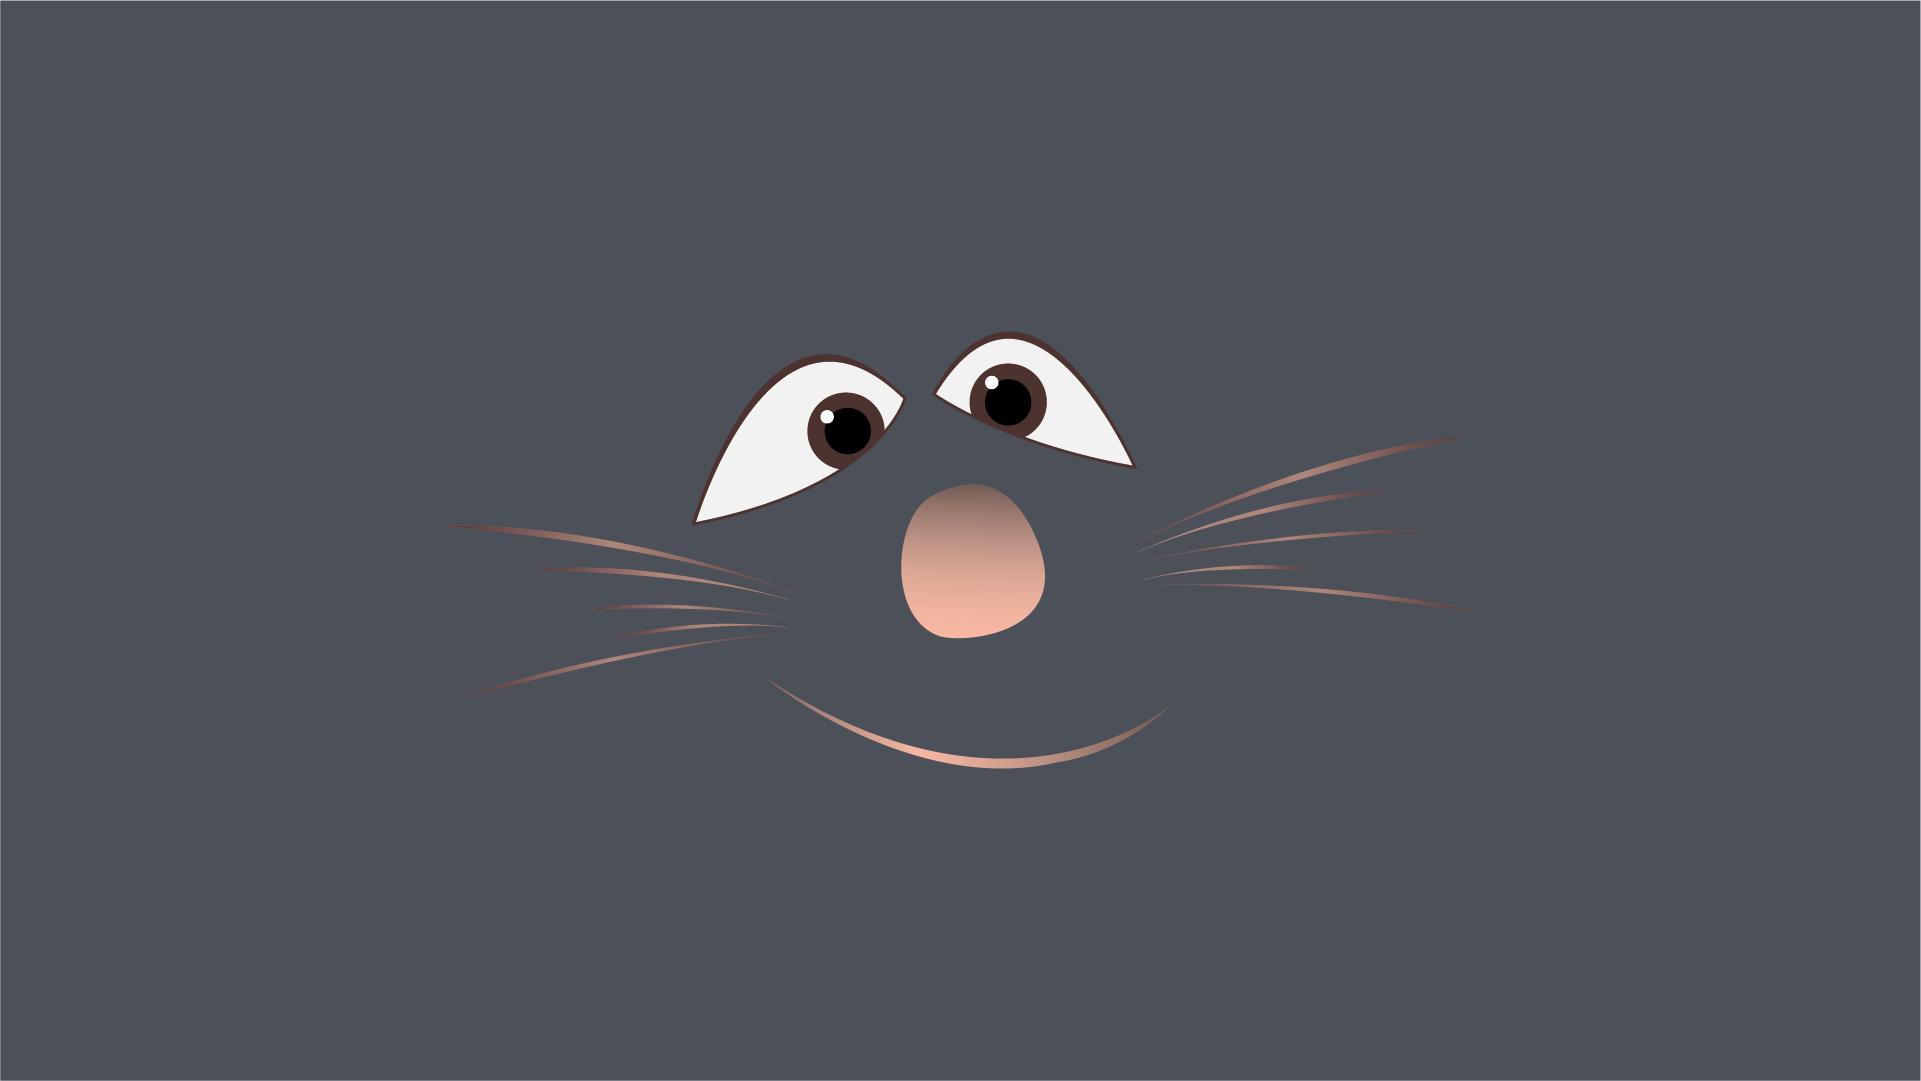 Fond d'écran Disney Pixar #3 : Ratatouille | Disney pixar